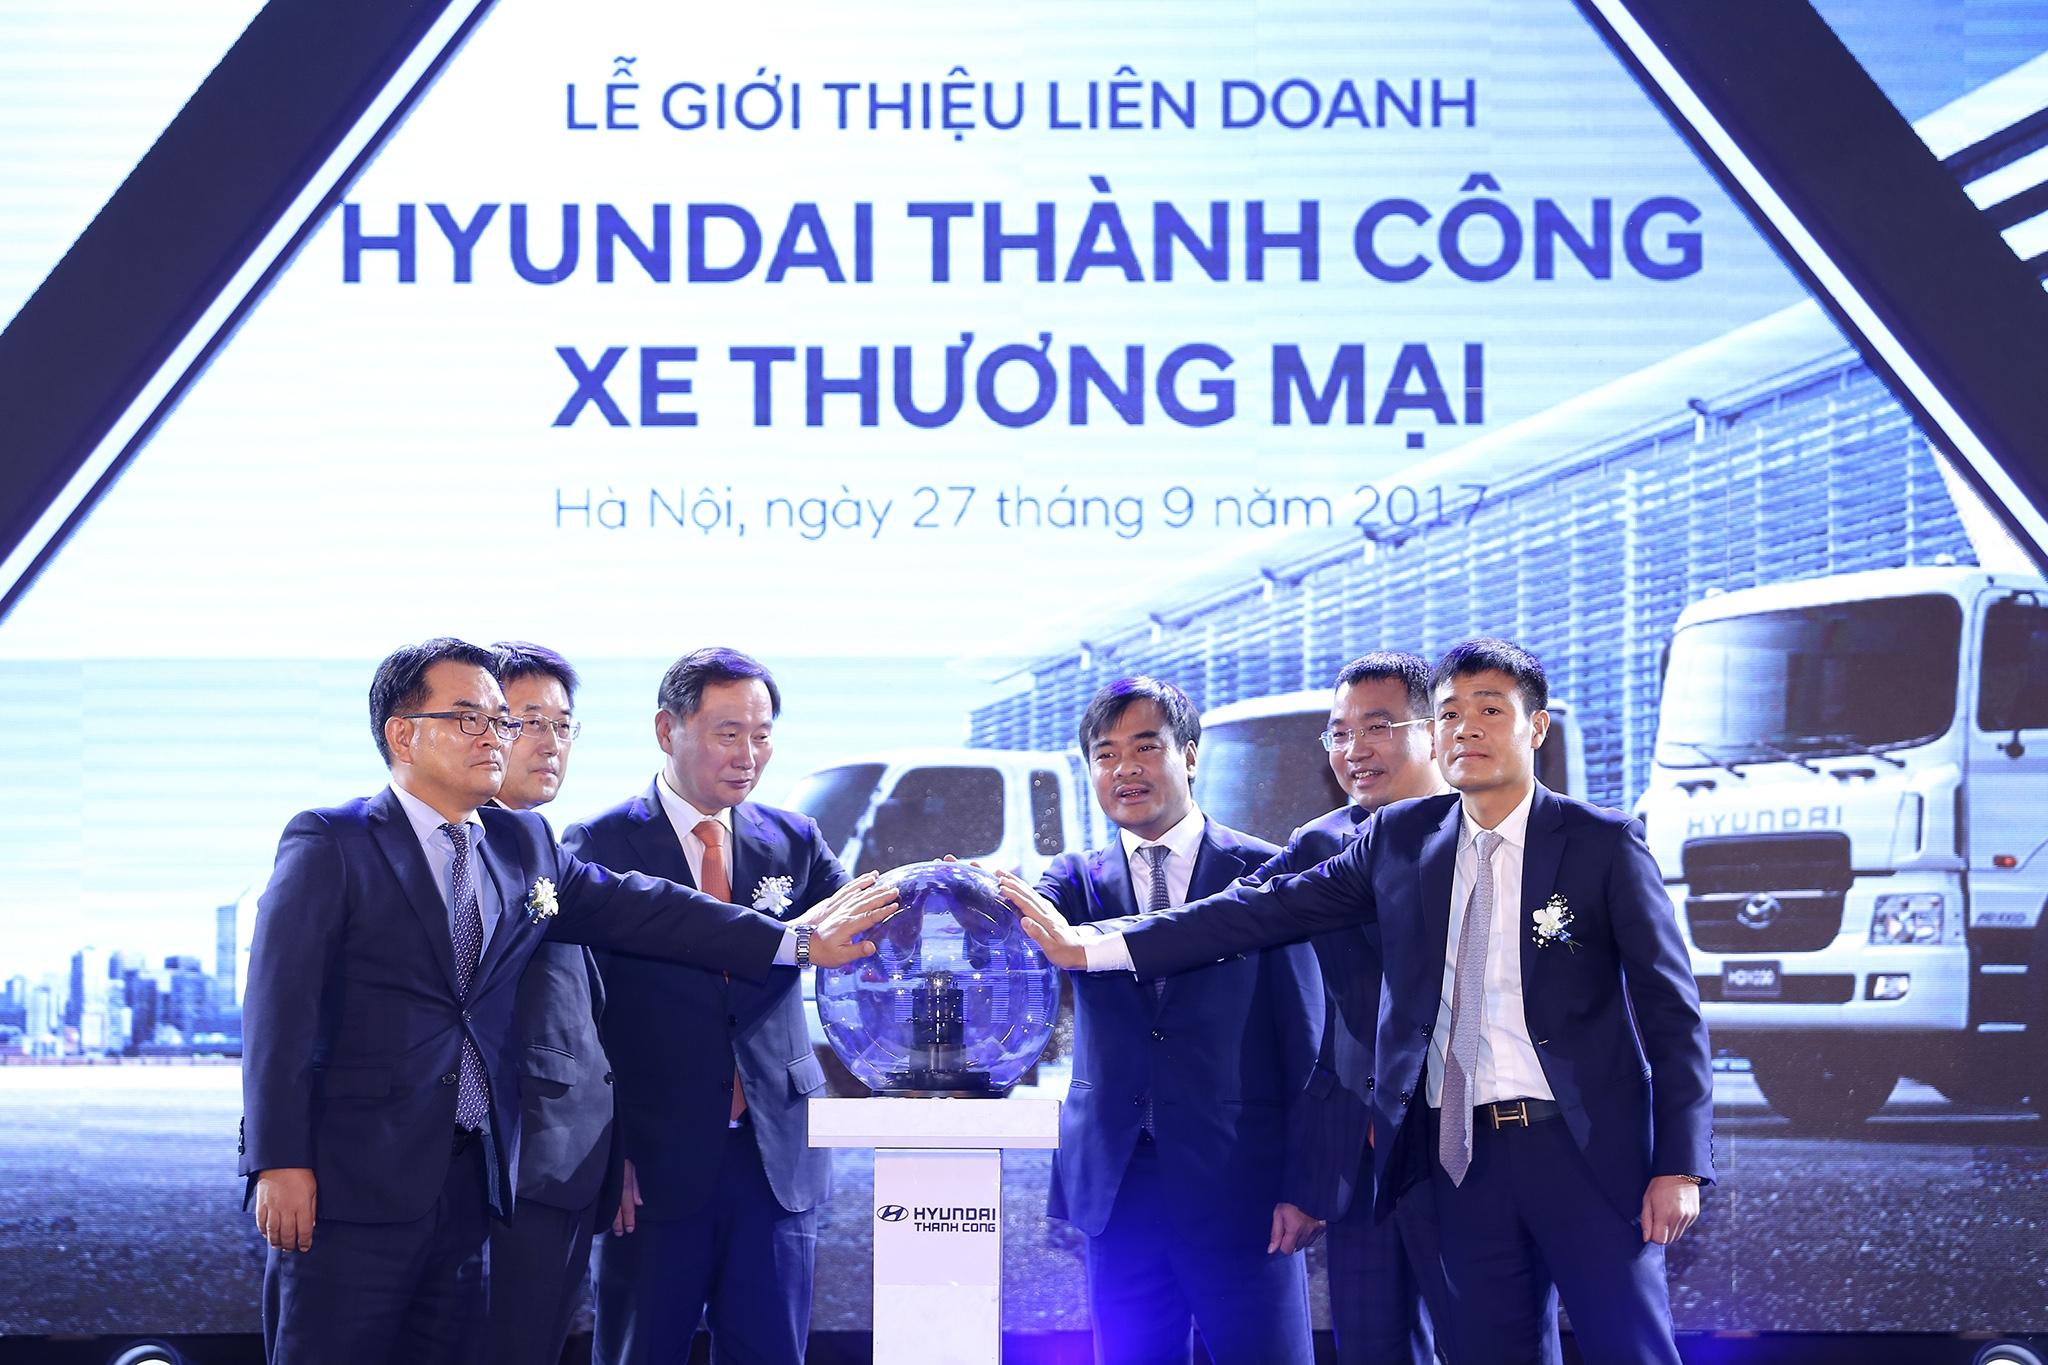 hyundai thanh cong thau tom not xe thuong mai tai viet nam